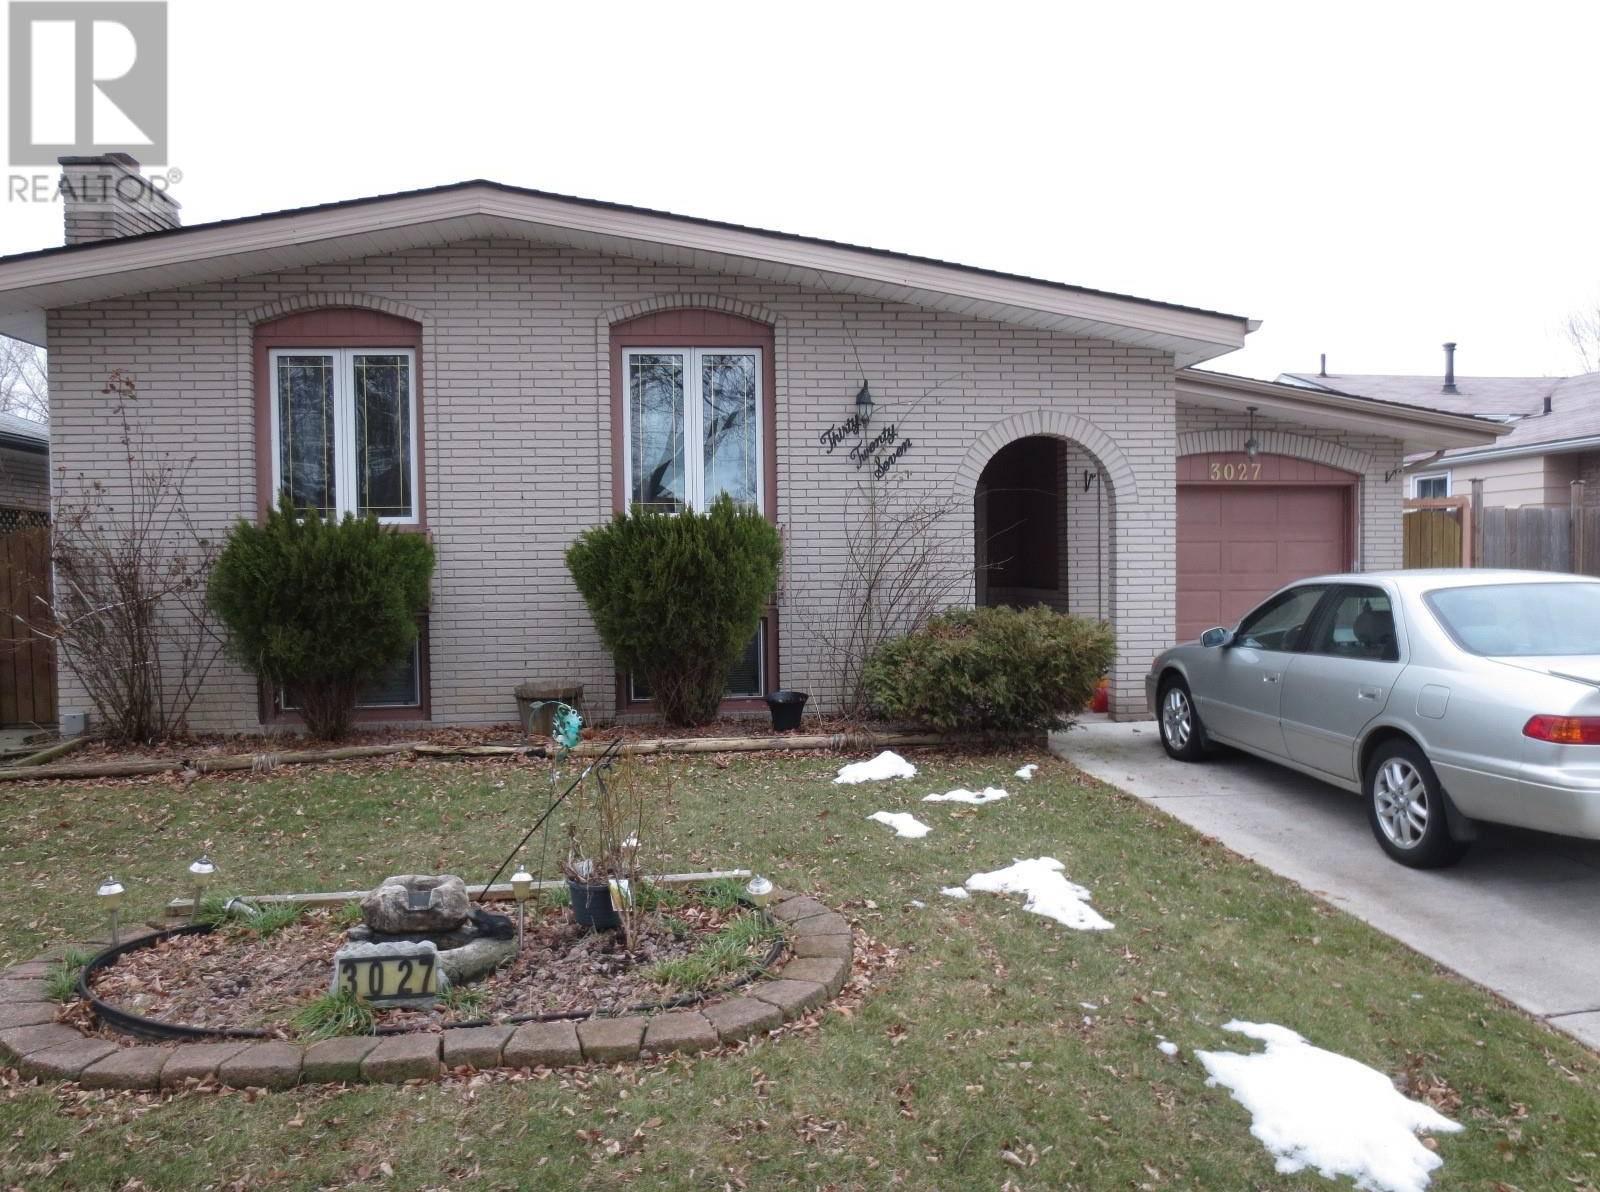 House for sale at 3027 Regis  Windsor Ontario - MLS: 20002091